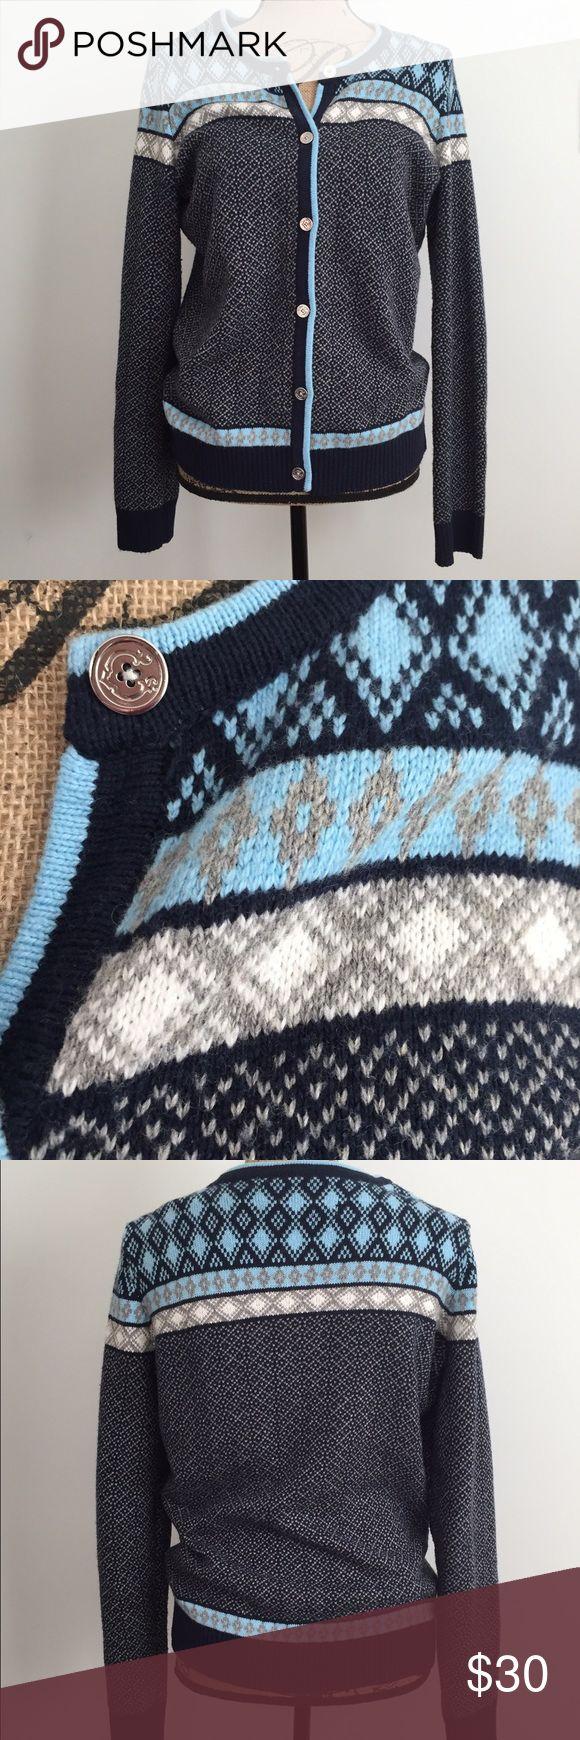 C Wonder Fair Isle Button-up Cardigan C Wonder:  Button up cardigan with fair isle design - beautiful buttons - NEVER WORN C Wonder Sweaters Cardigans